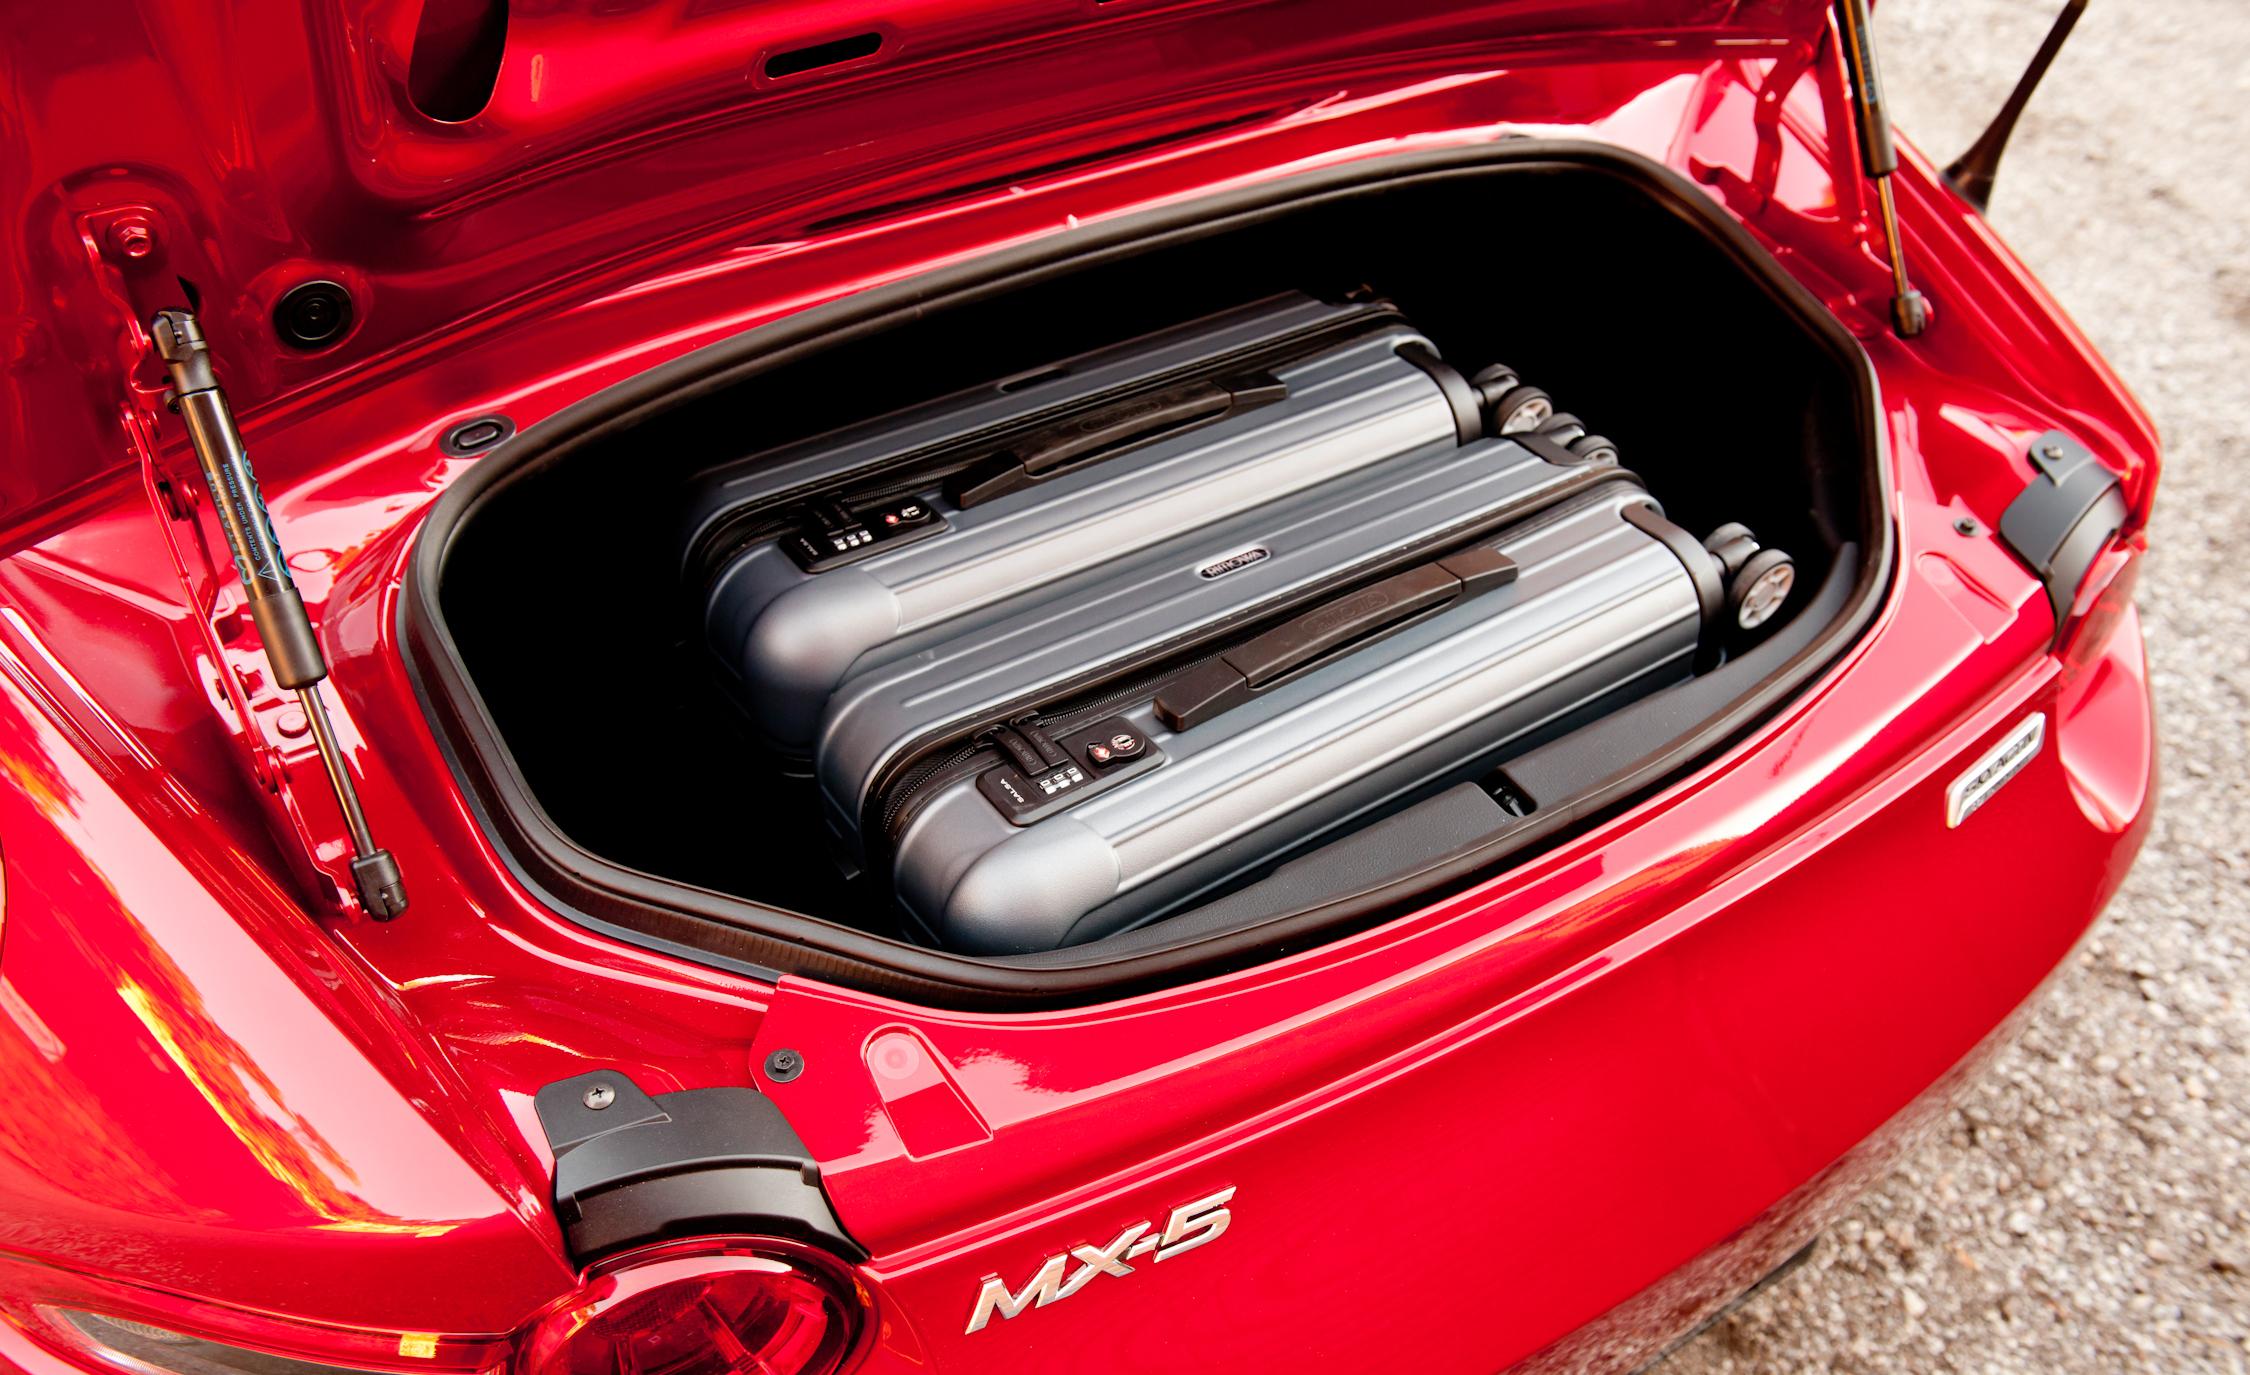 2016 Mazda MX-5 Miata Trunk Capacity